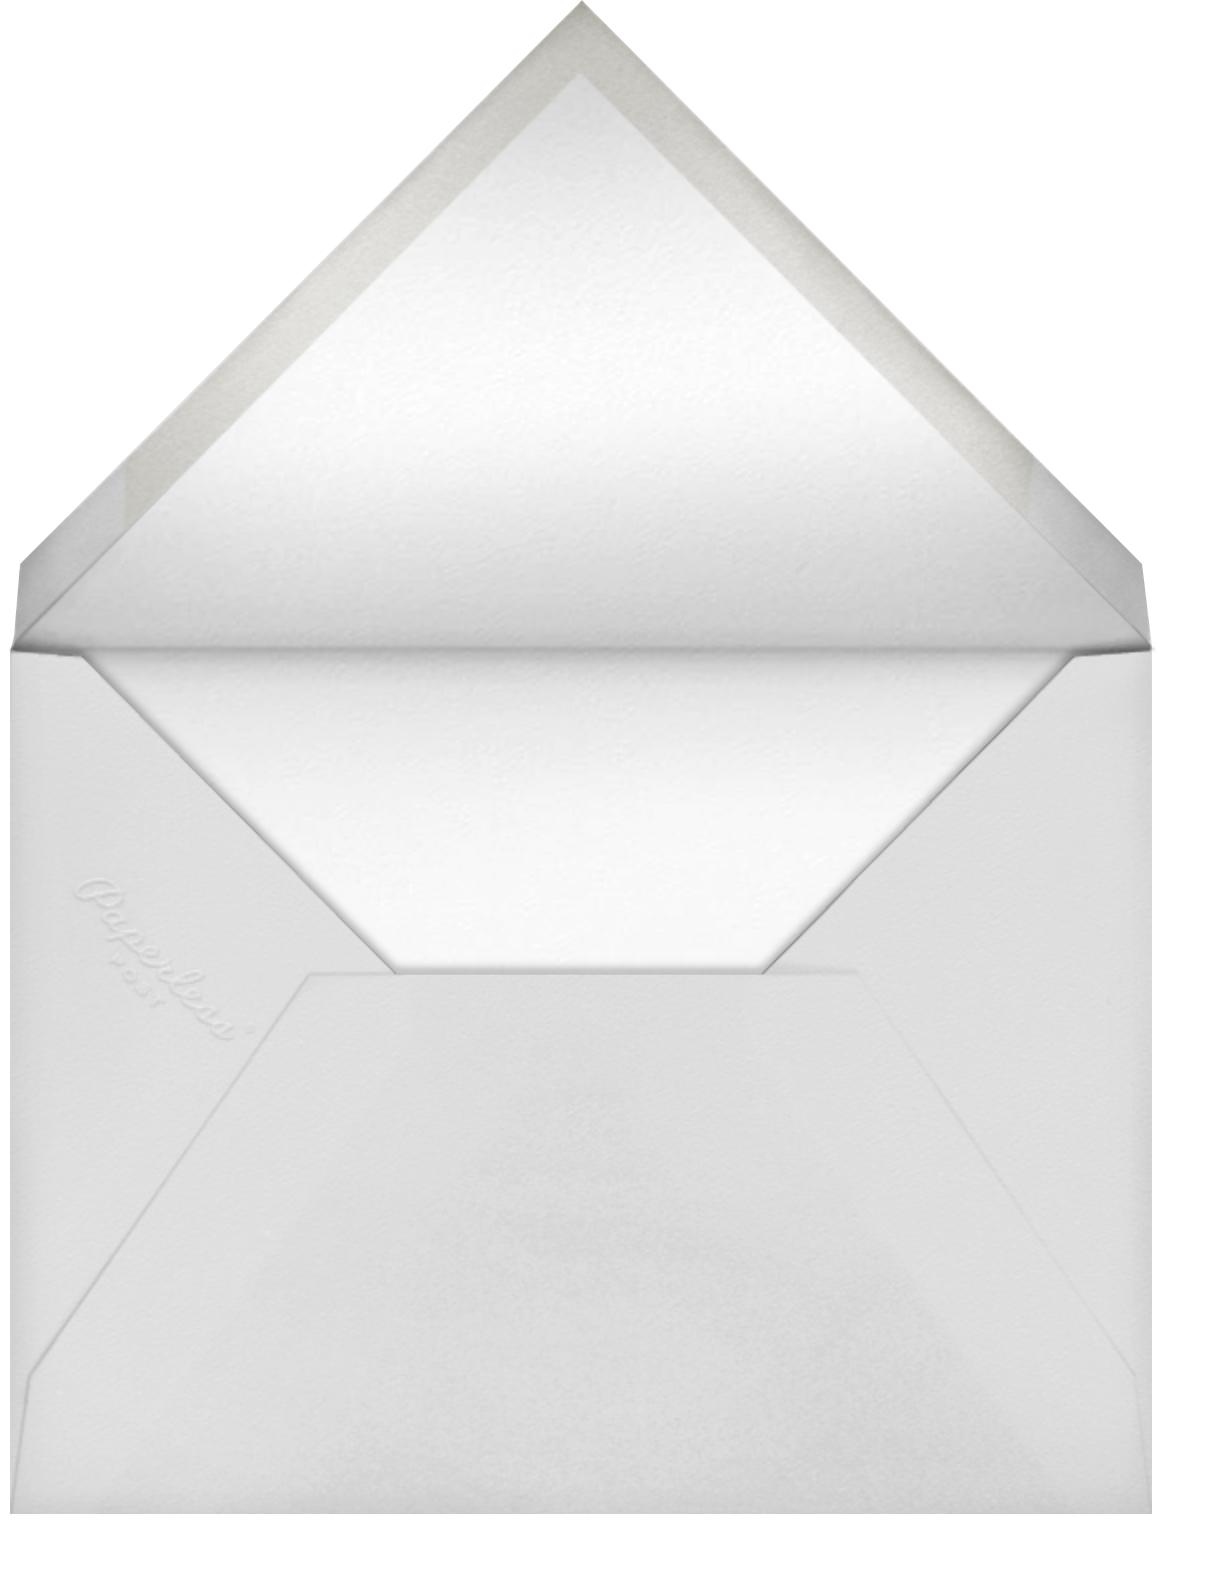 Fleurs d'Alençon - Antwerp - Oscar de la Renta - Bridal shower - envelope back